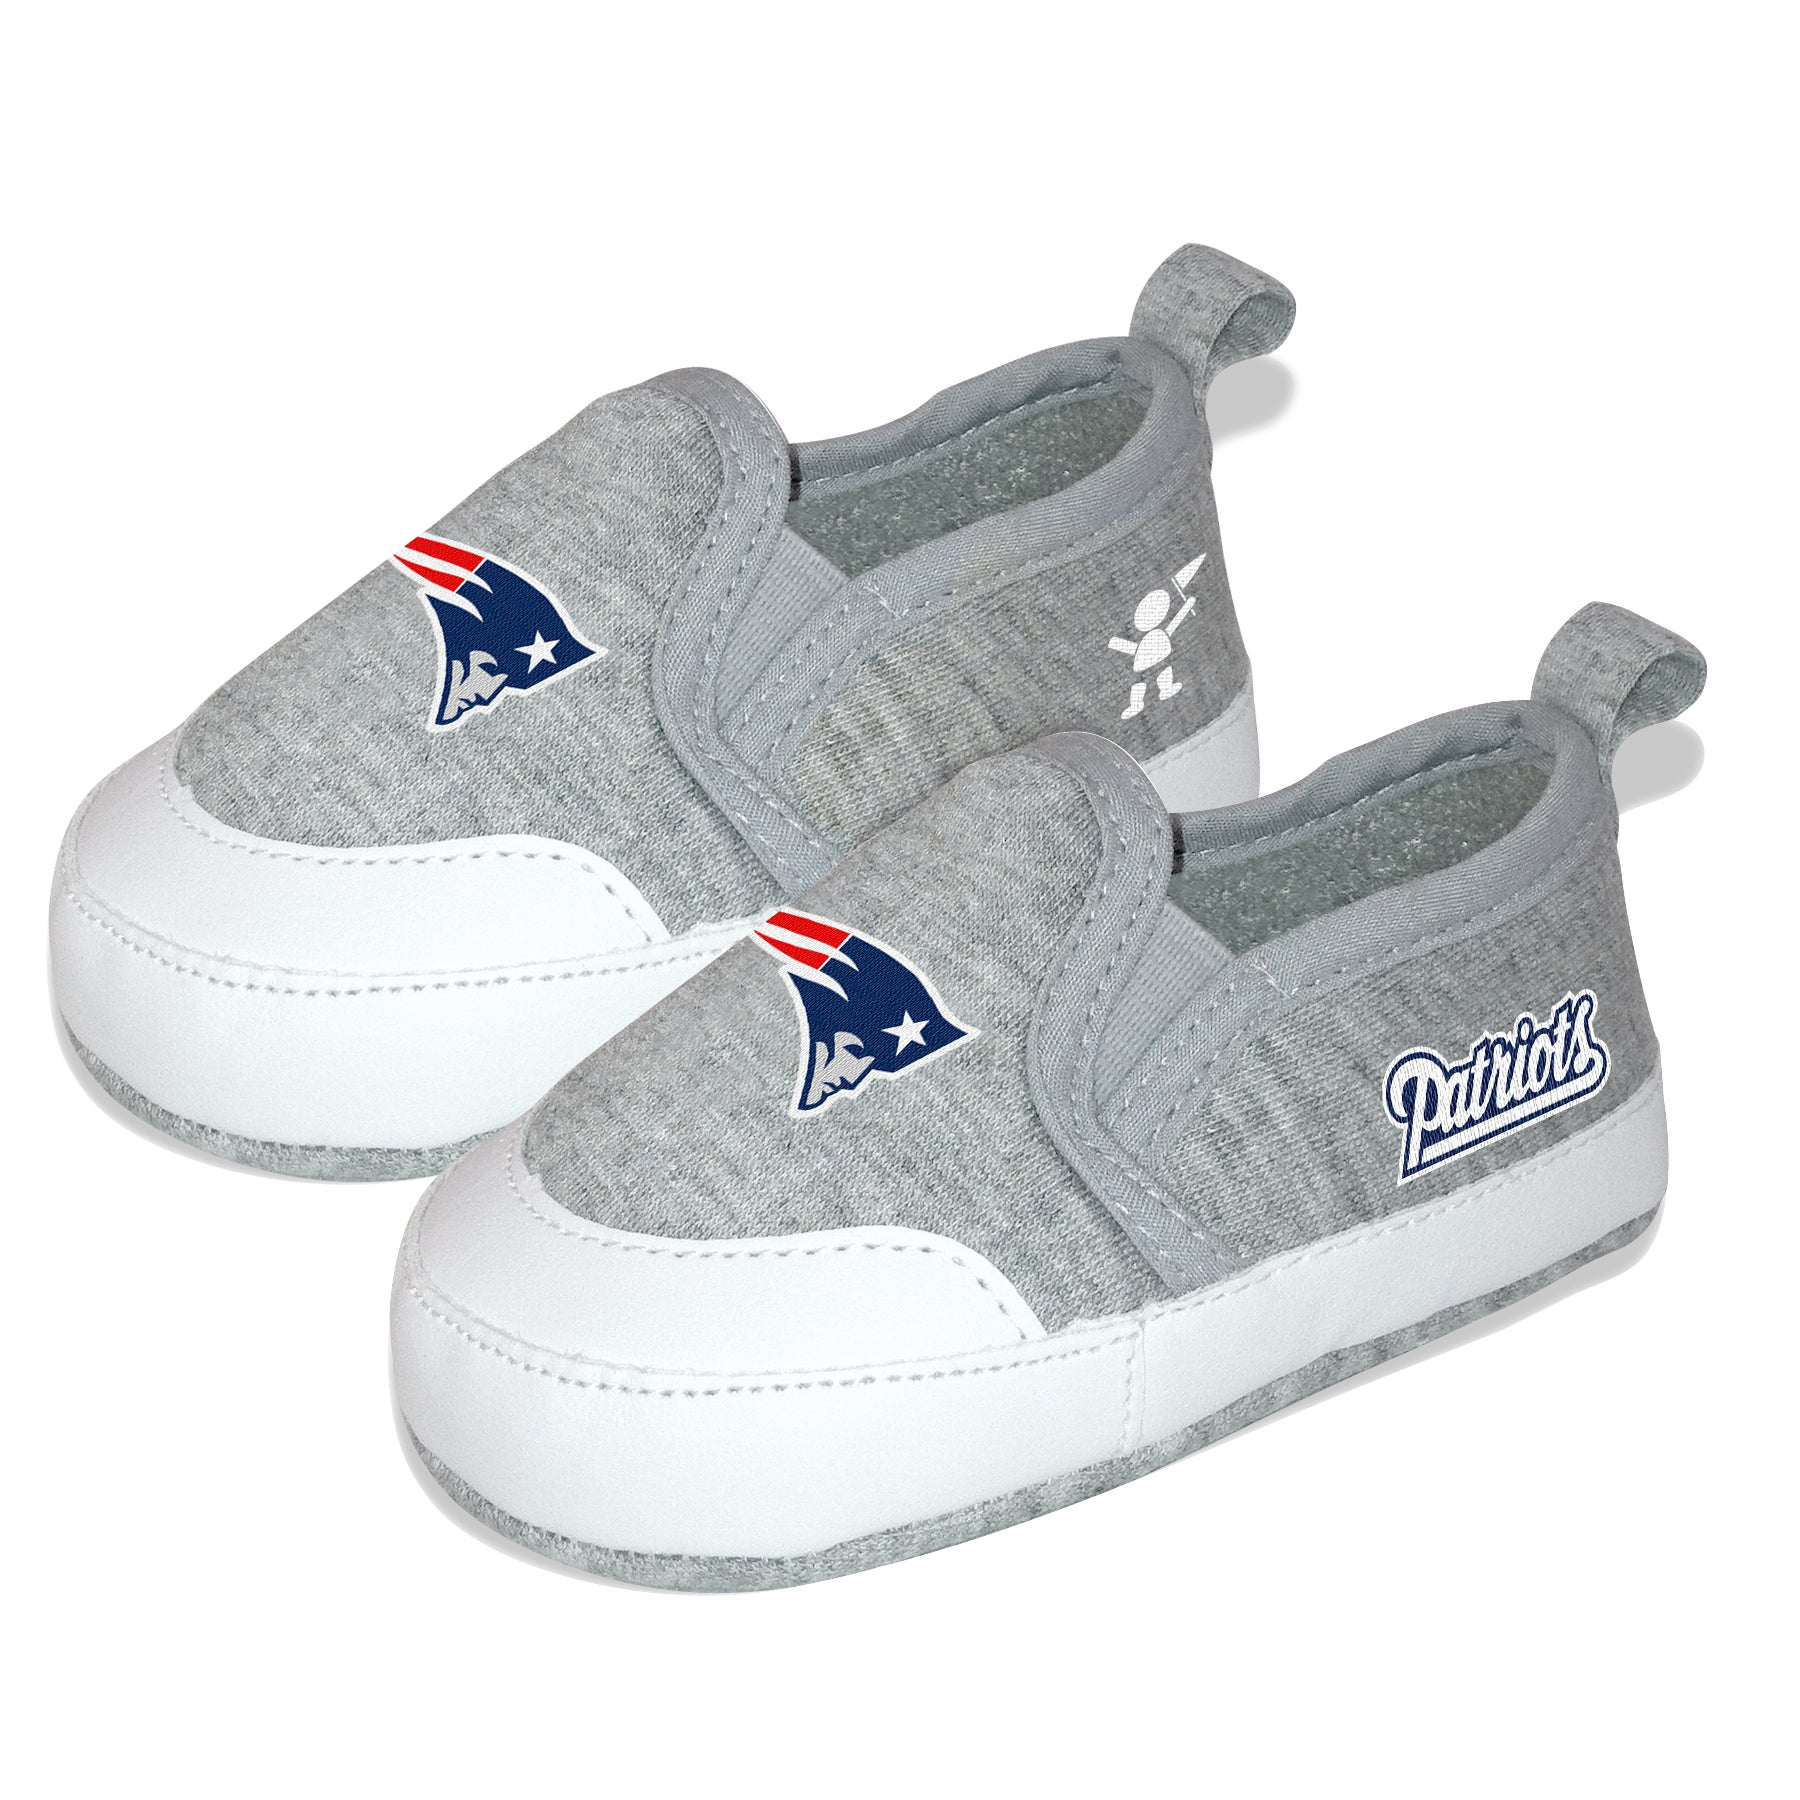 New England Patriots Pre-walk Baby Shoes